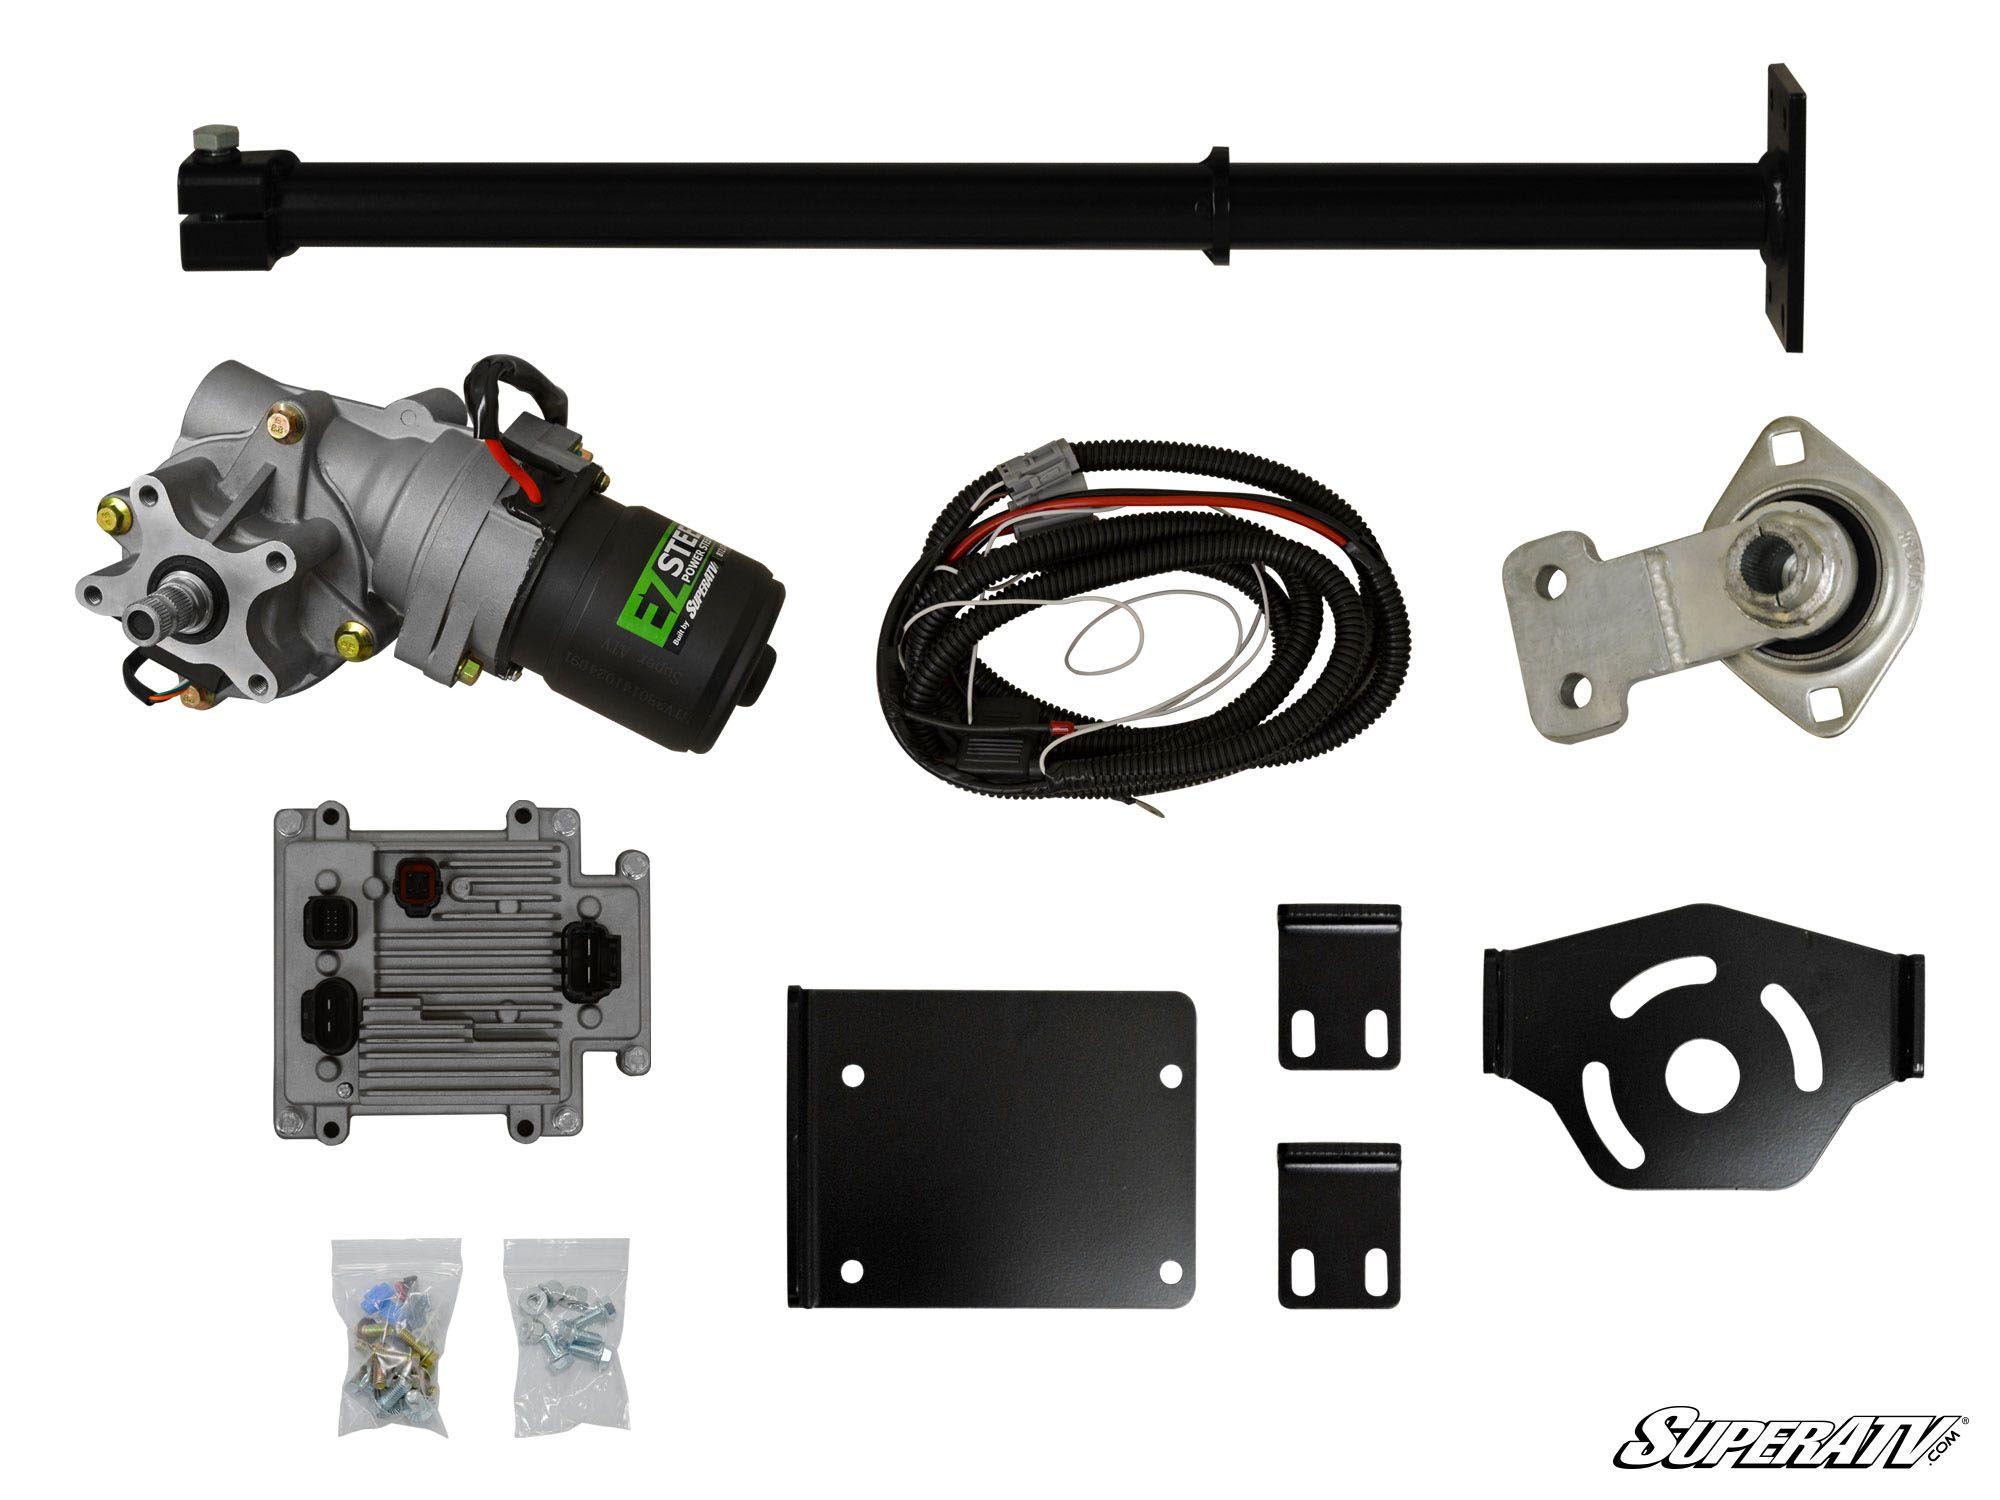 superatv polaris sportsman xp scrambler power steering kit  polaris power steering wiring harness #14